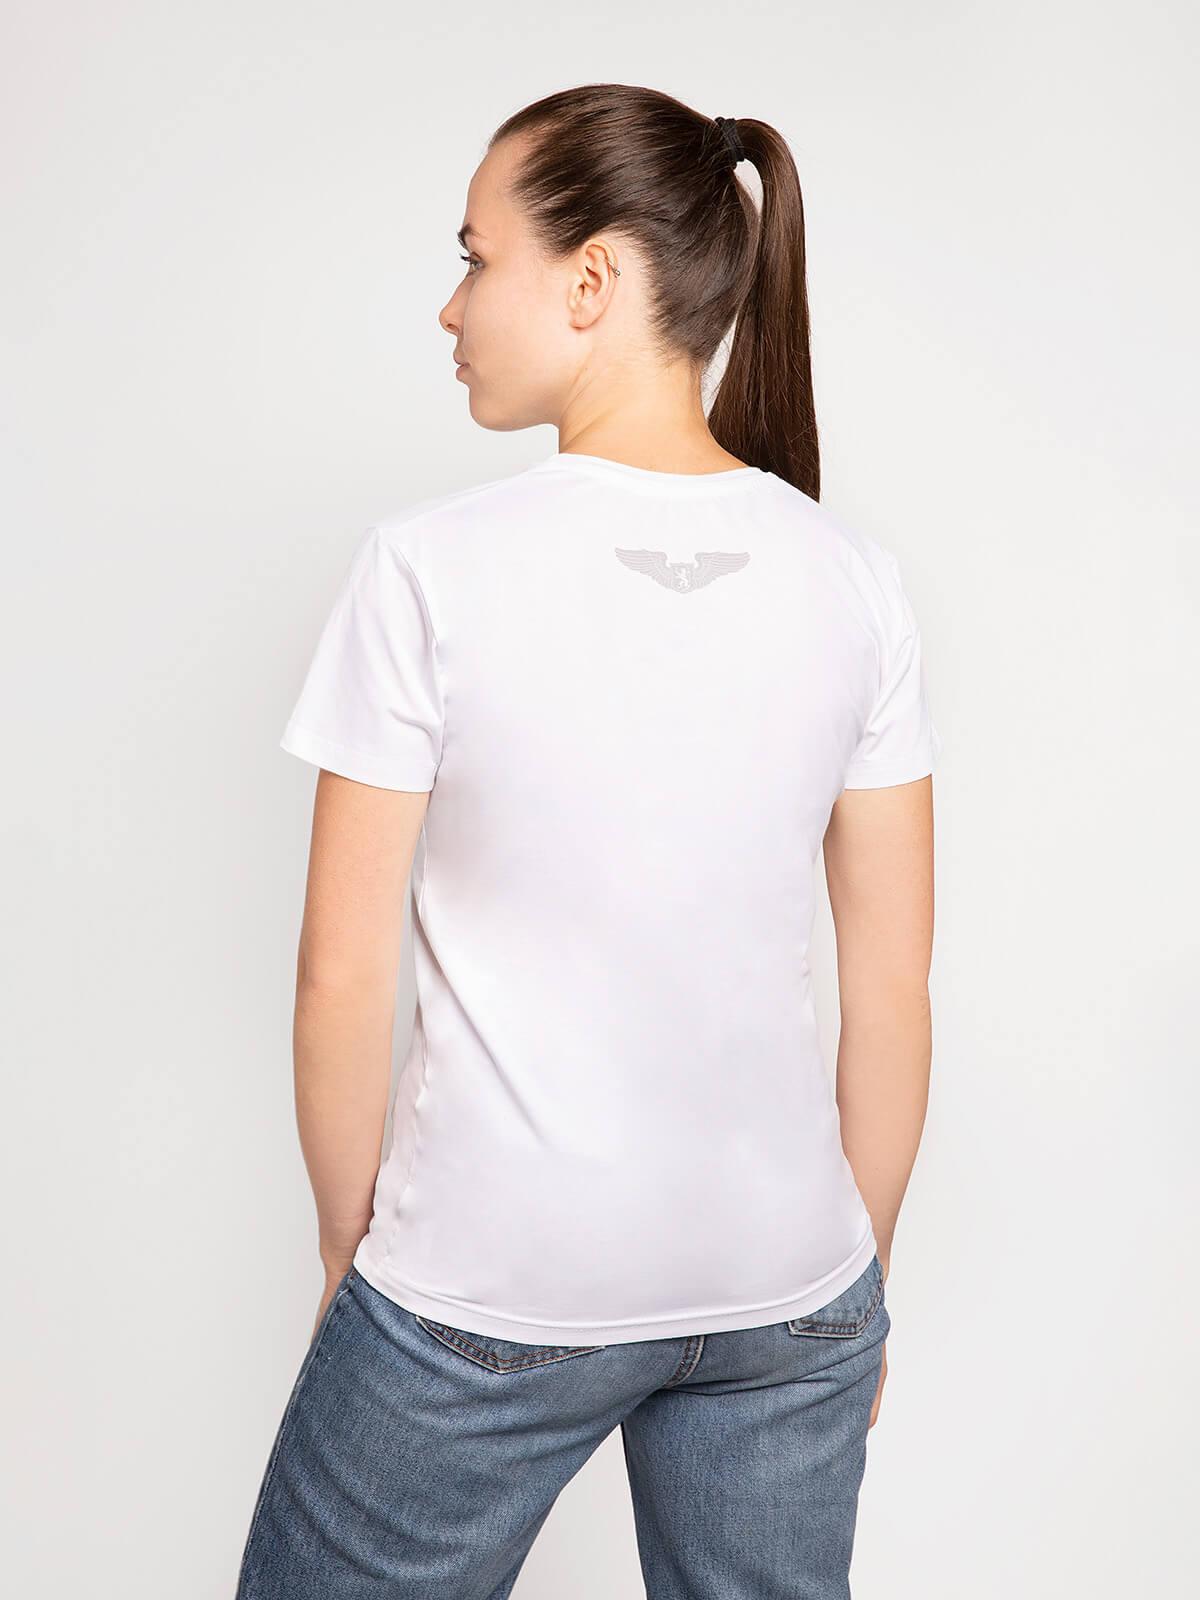 Women's T-Shirt Lion (Roundel). Color white.  Technique of prints applied: silkscreen printing.